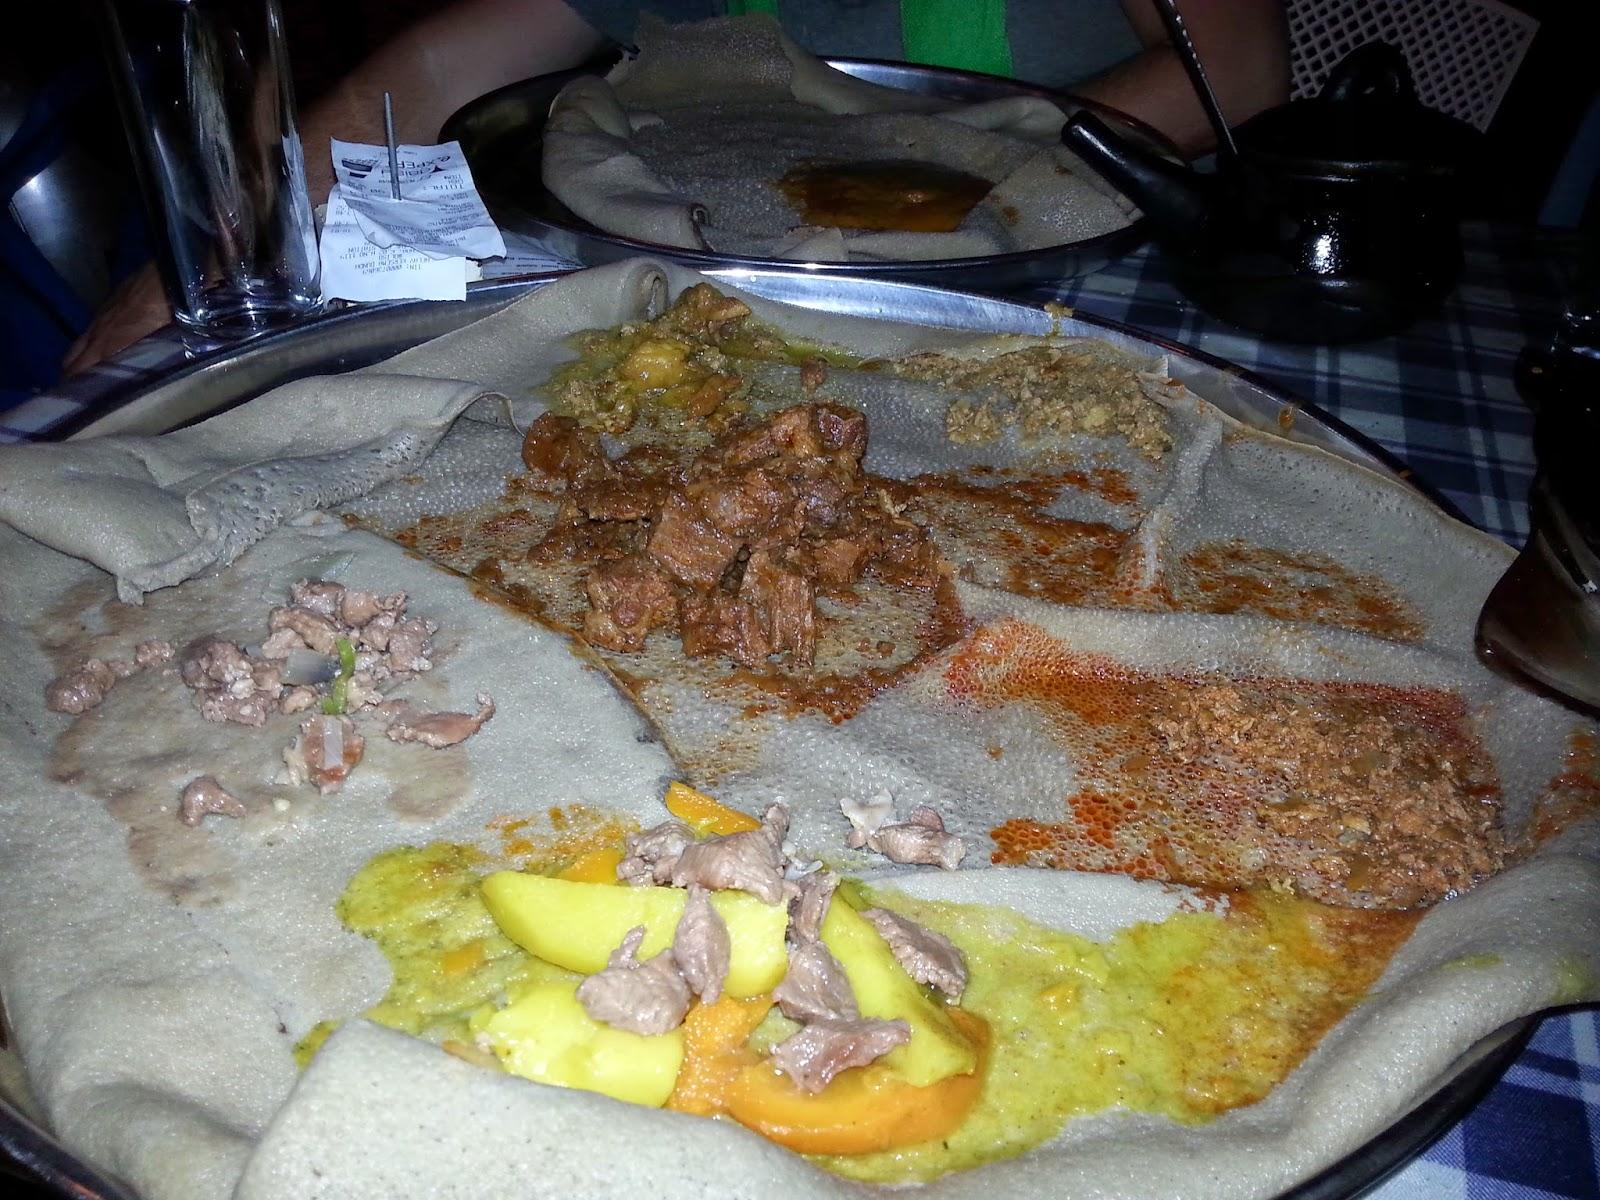 ashleysayque: Ethiopian food